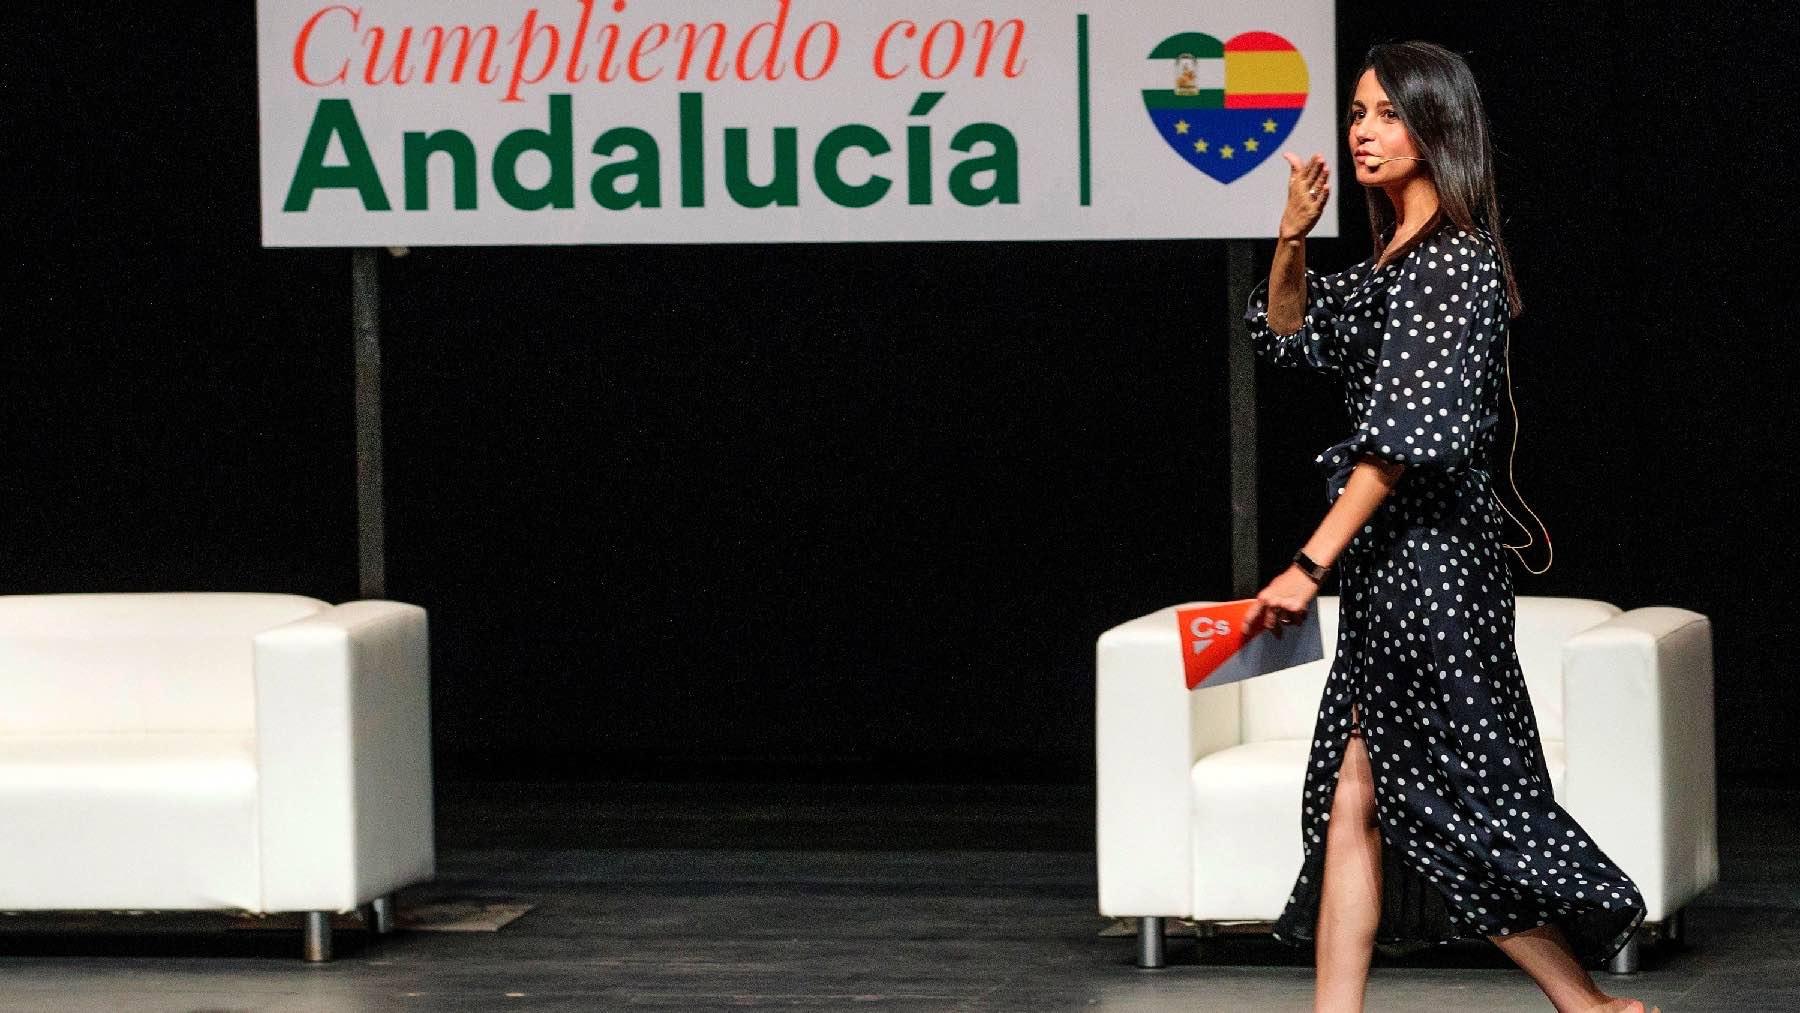 Inés Arrimadas en Andalucía. (Foto: EFE)